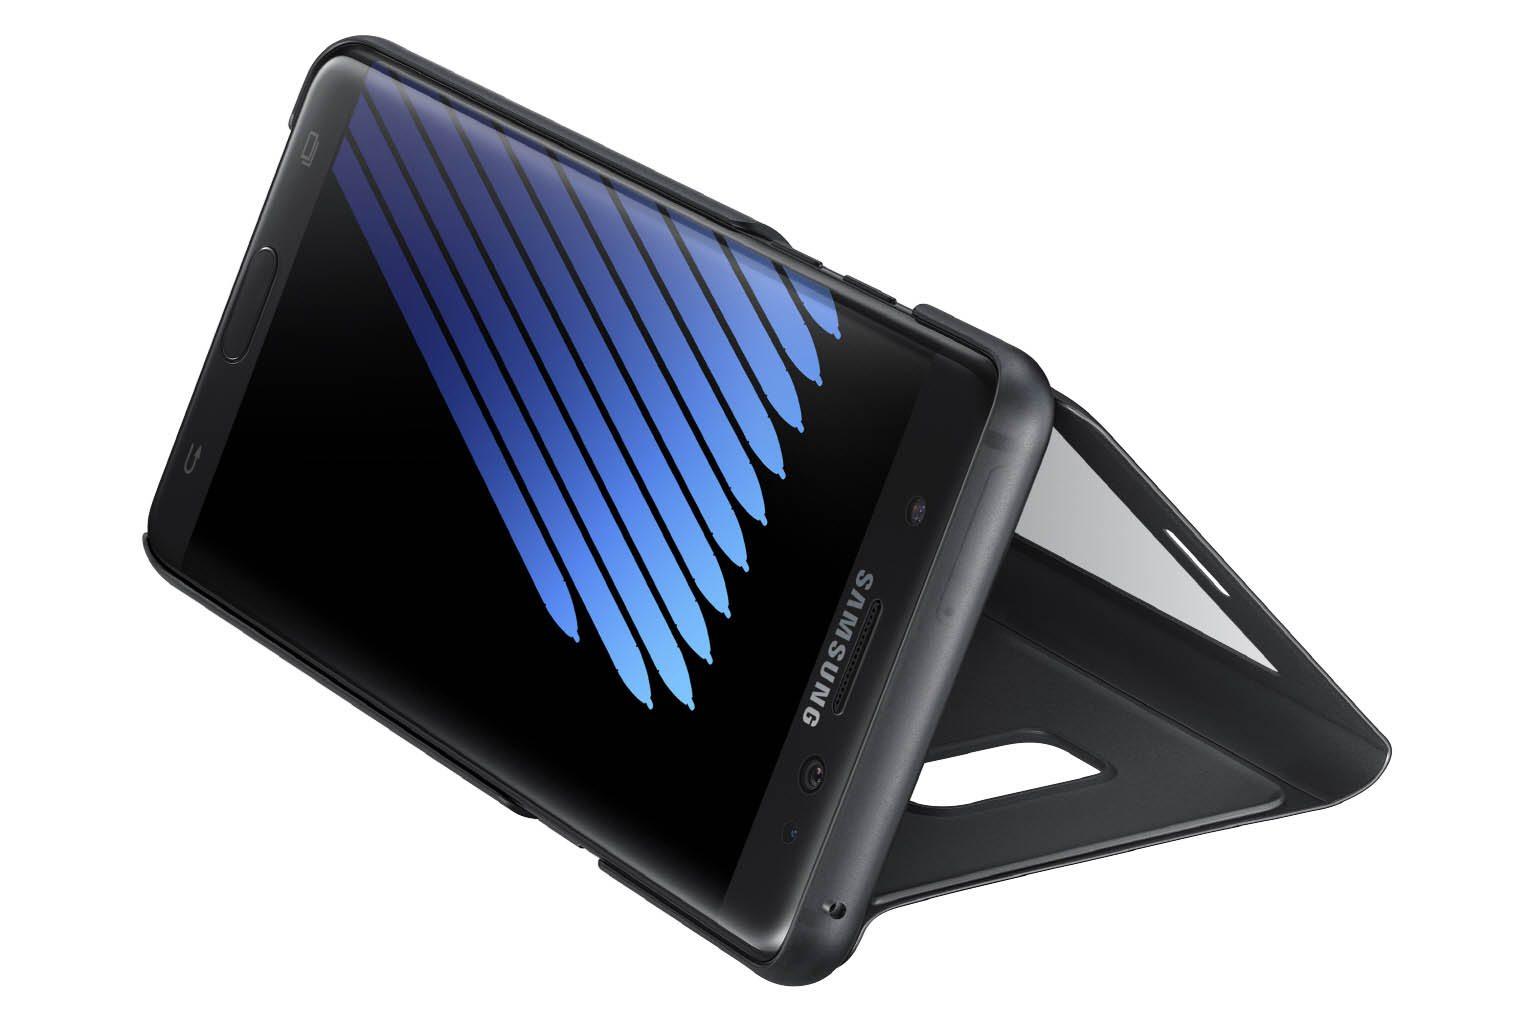 Galaxy Note 7 6GB RAM price leak